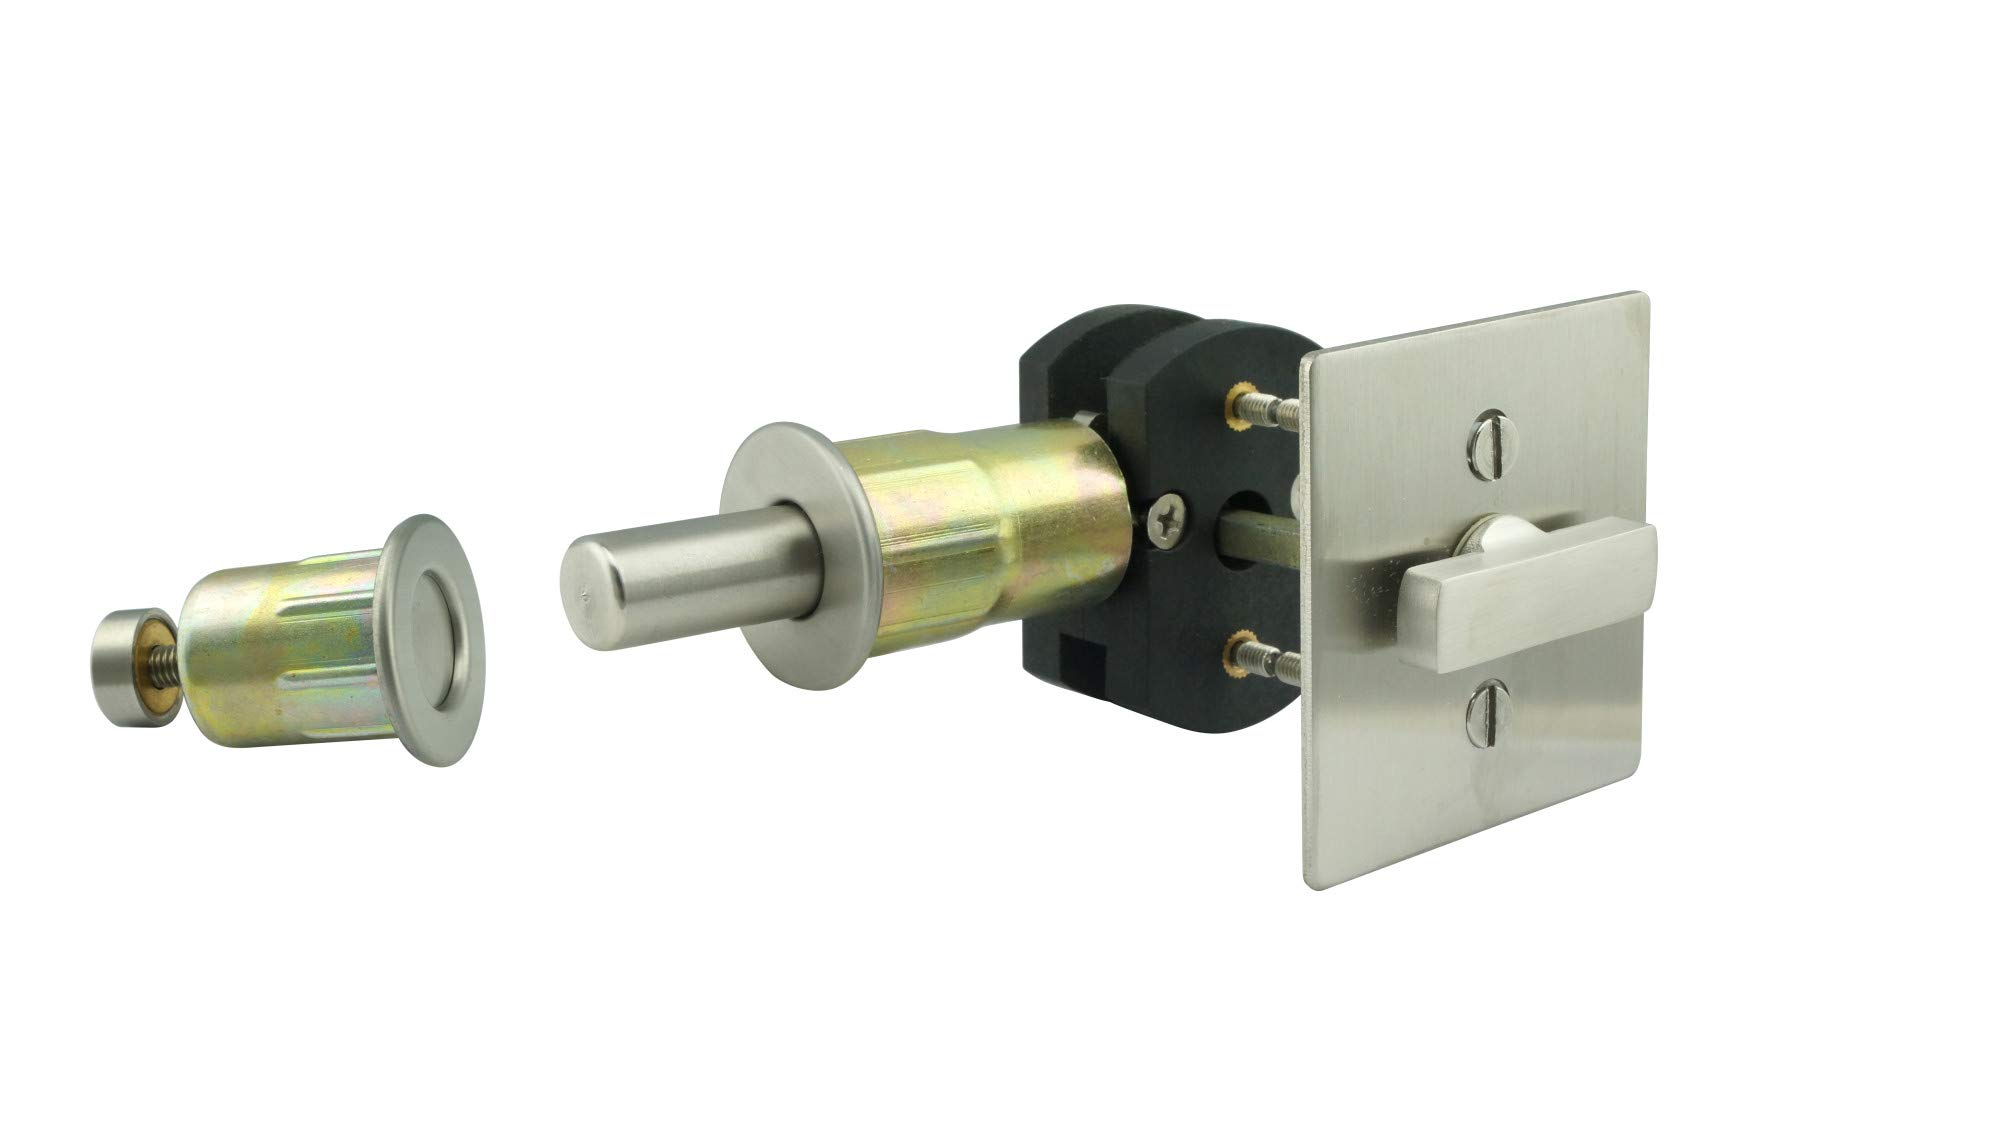 INOX EC1314-BD4312-10B Privacy Lock for Sliding Barn Door with TT14 Thumbturn, Square Rose and 3-1/2'' Backset